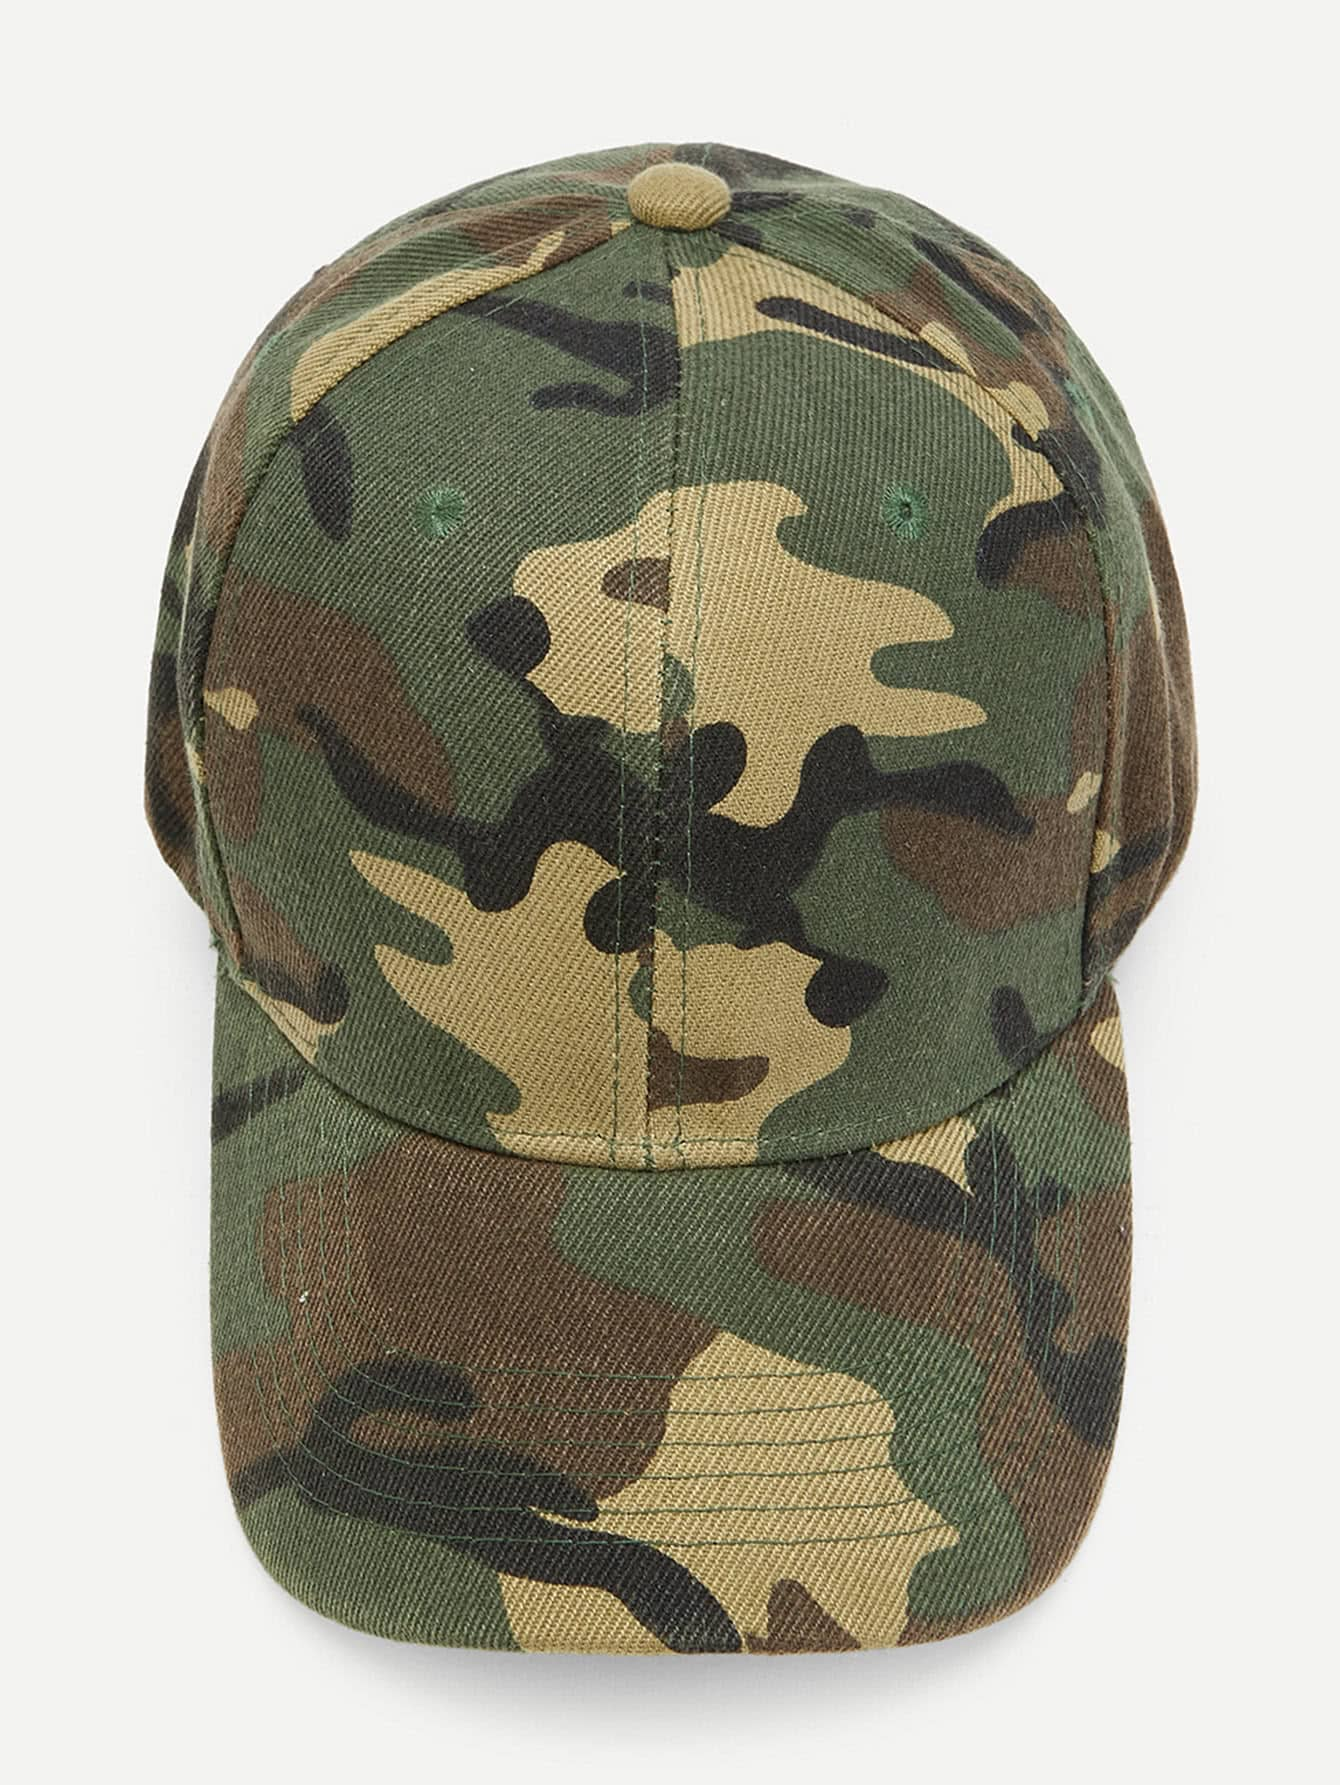 5caf83b8f94 Camouflage Baseball Cap